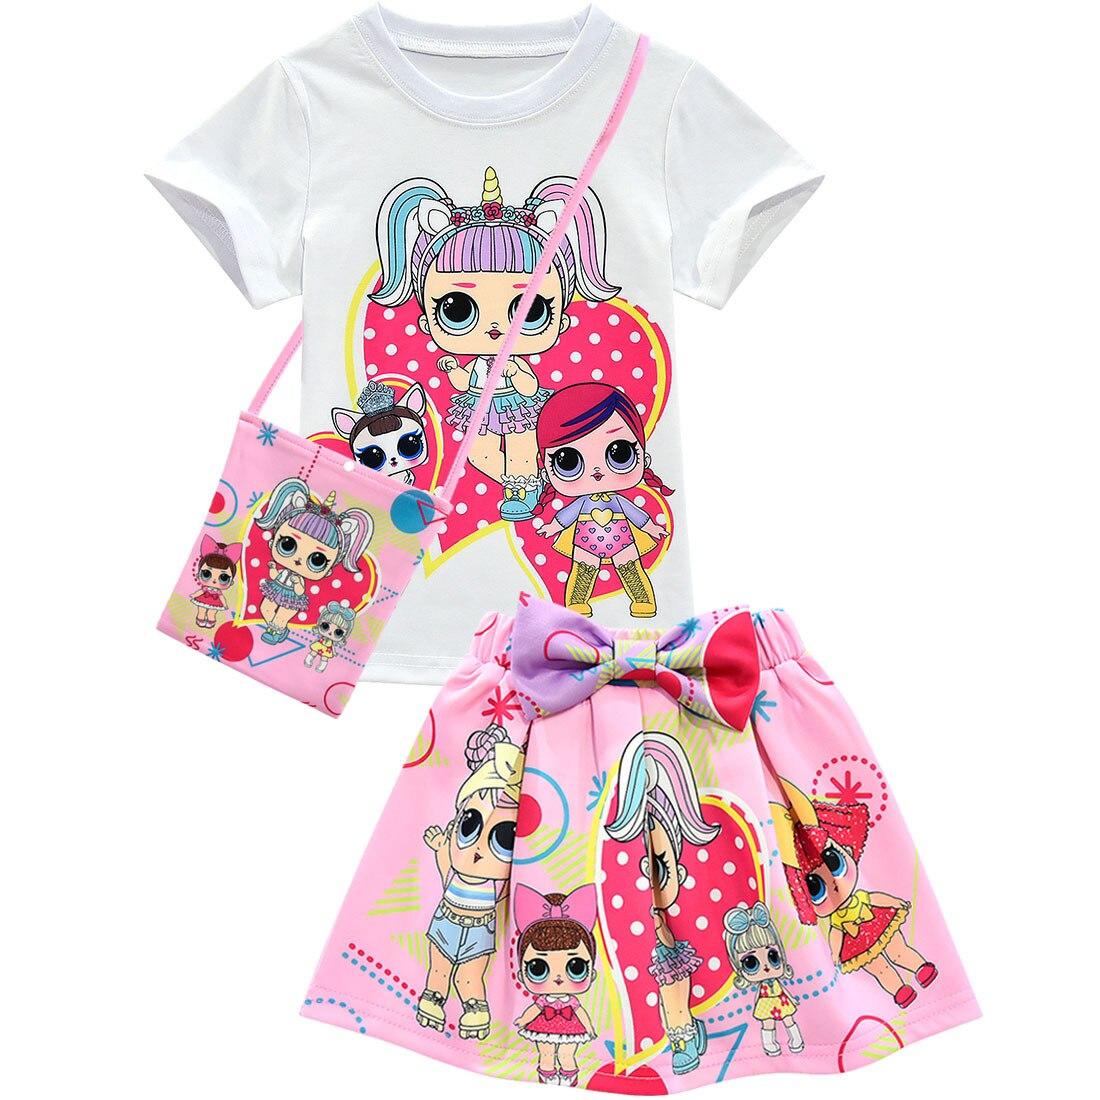 Summer Toddler Girls Lol Clothes Set Cartoon Cute Kids Party Dresses For Kids Clothing Princess Dress Cotton T-shirt+skirt Bag